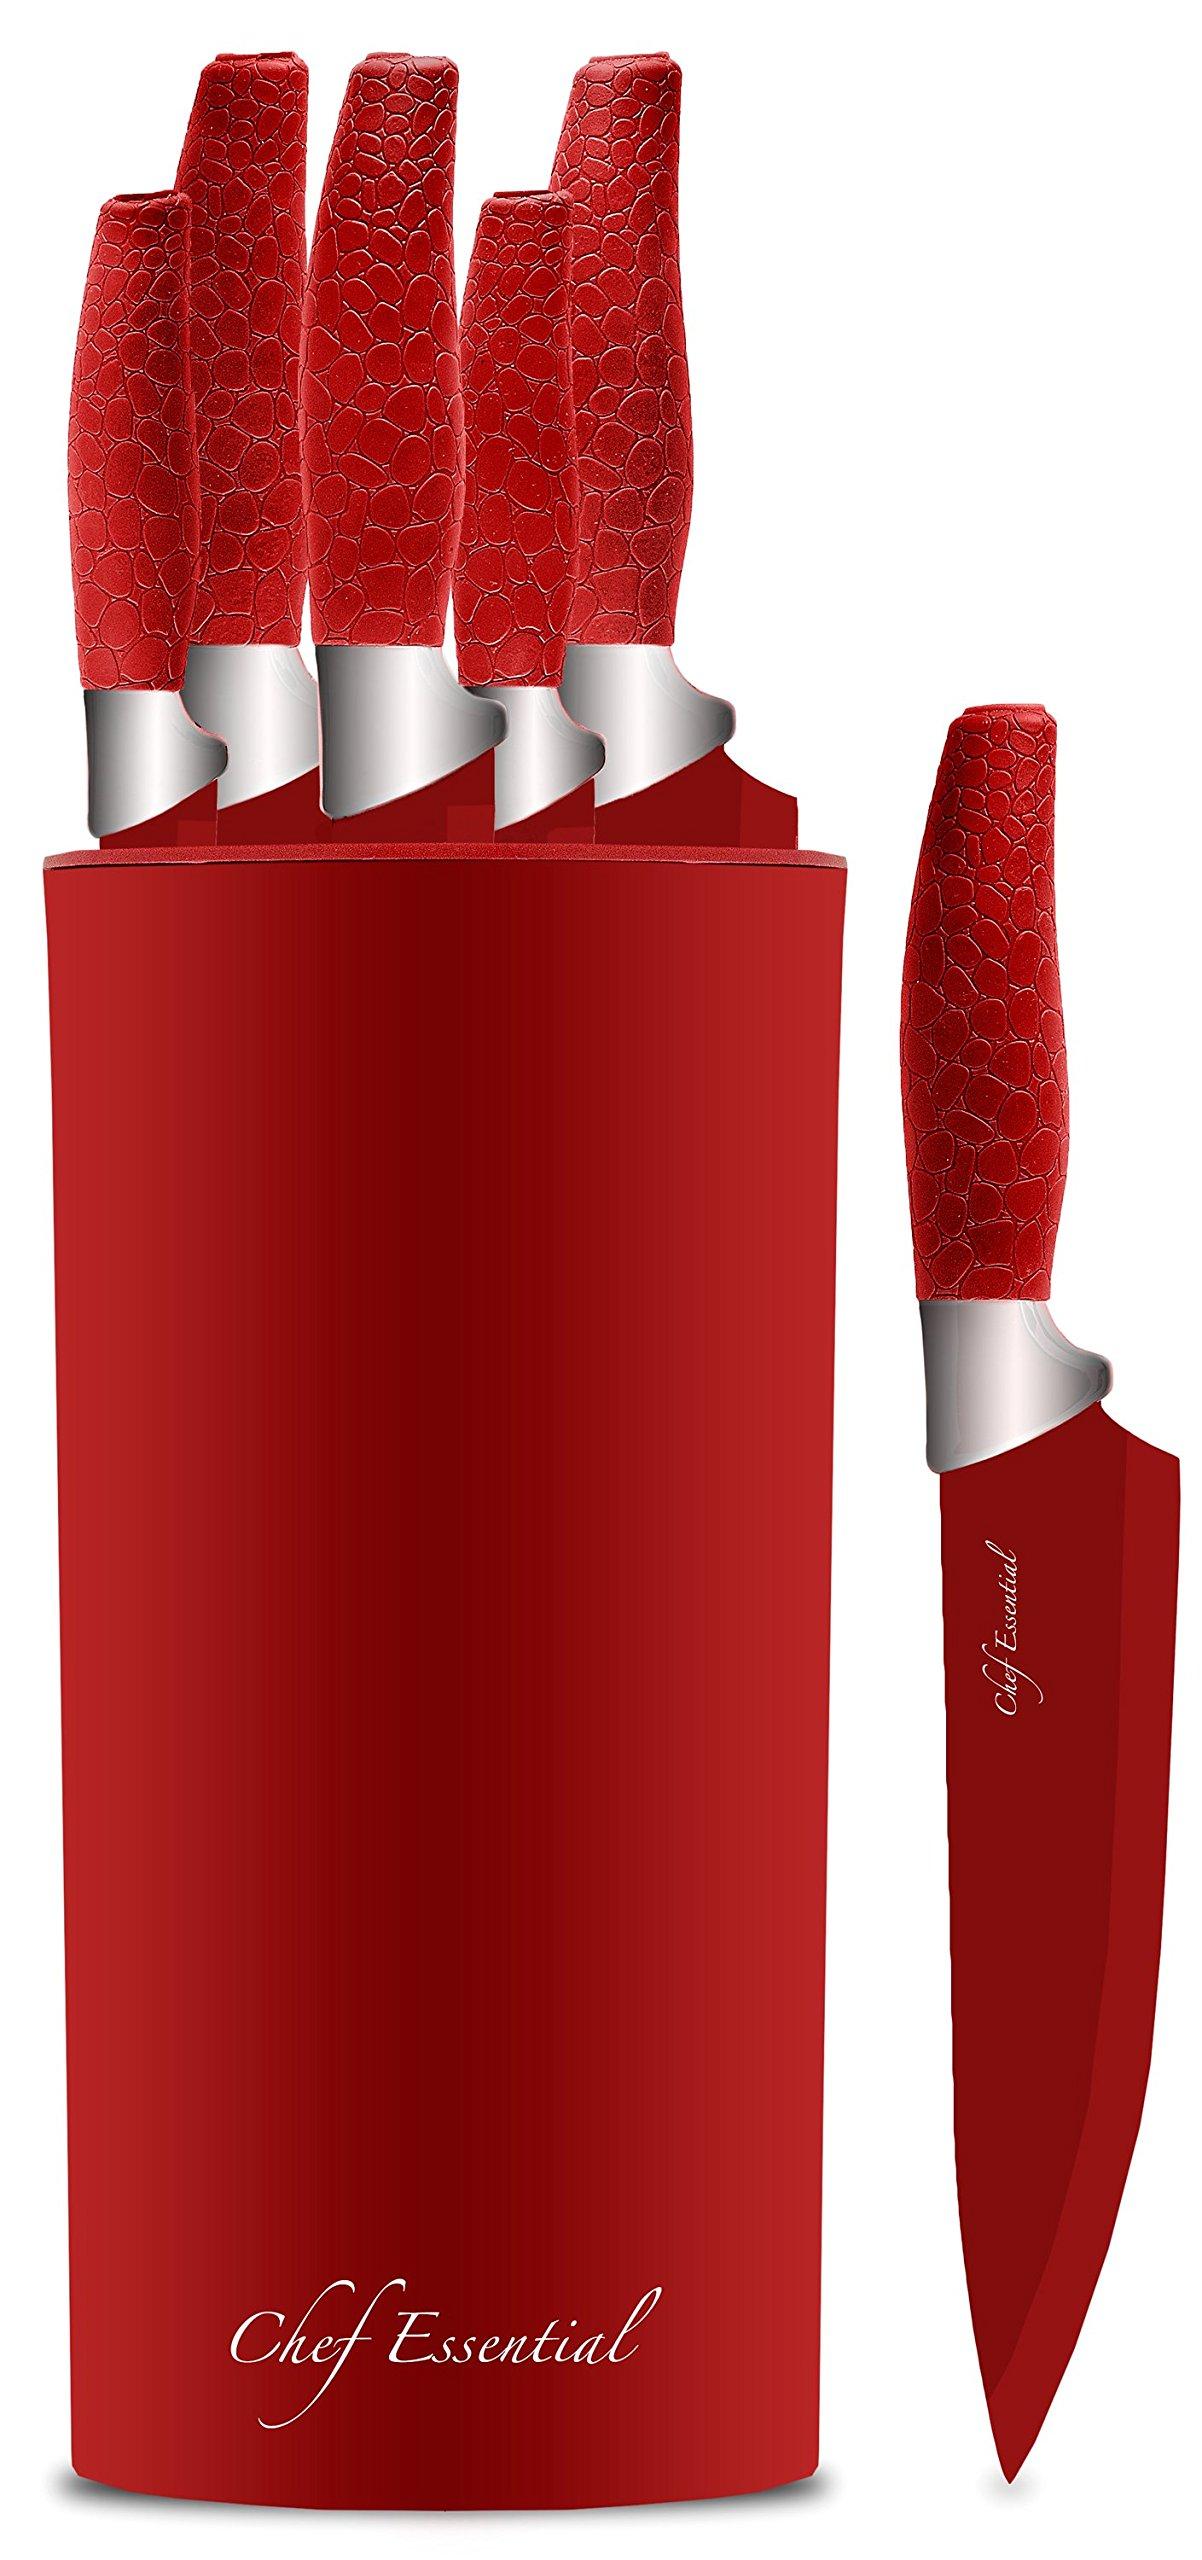 Chef Essential 7 Piece Knife Block Set, NEC Series, Red